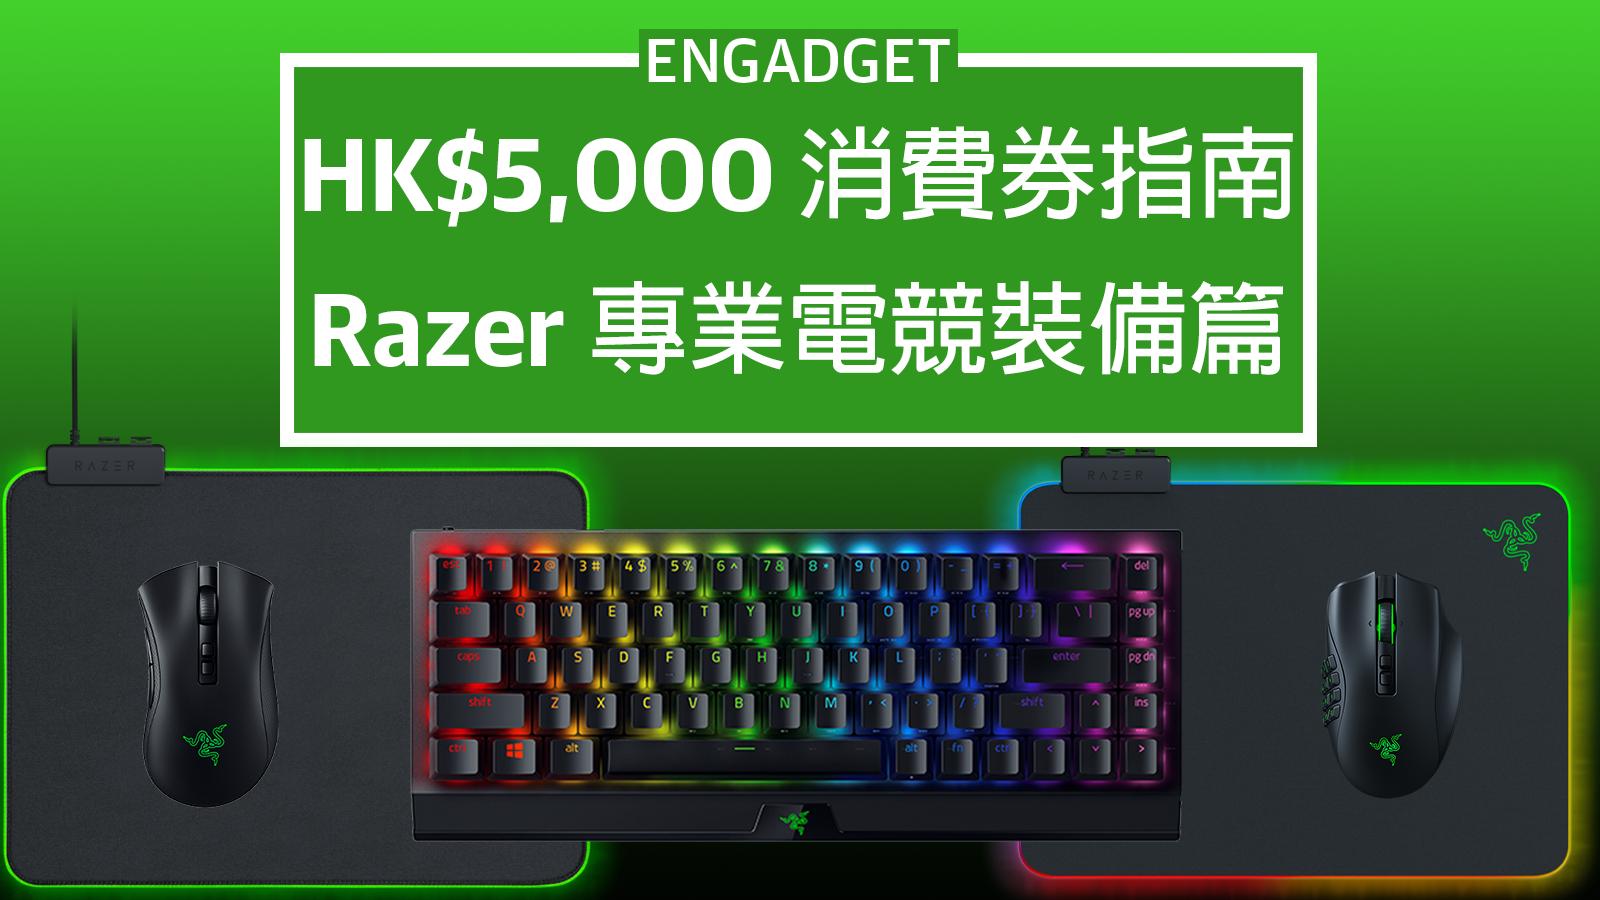 HK$5,000 消費券購物指南:Razer 電競裝備篇